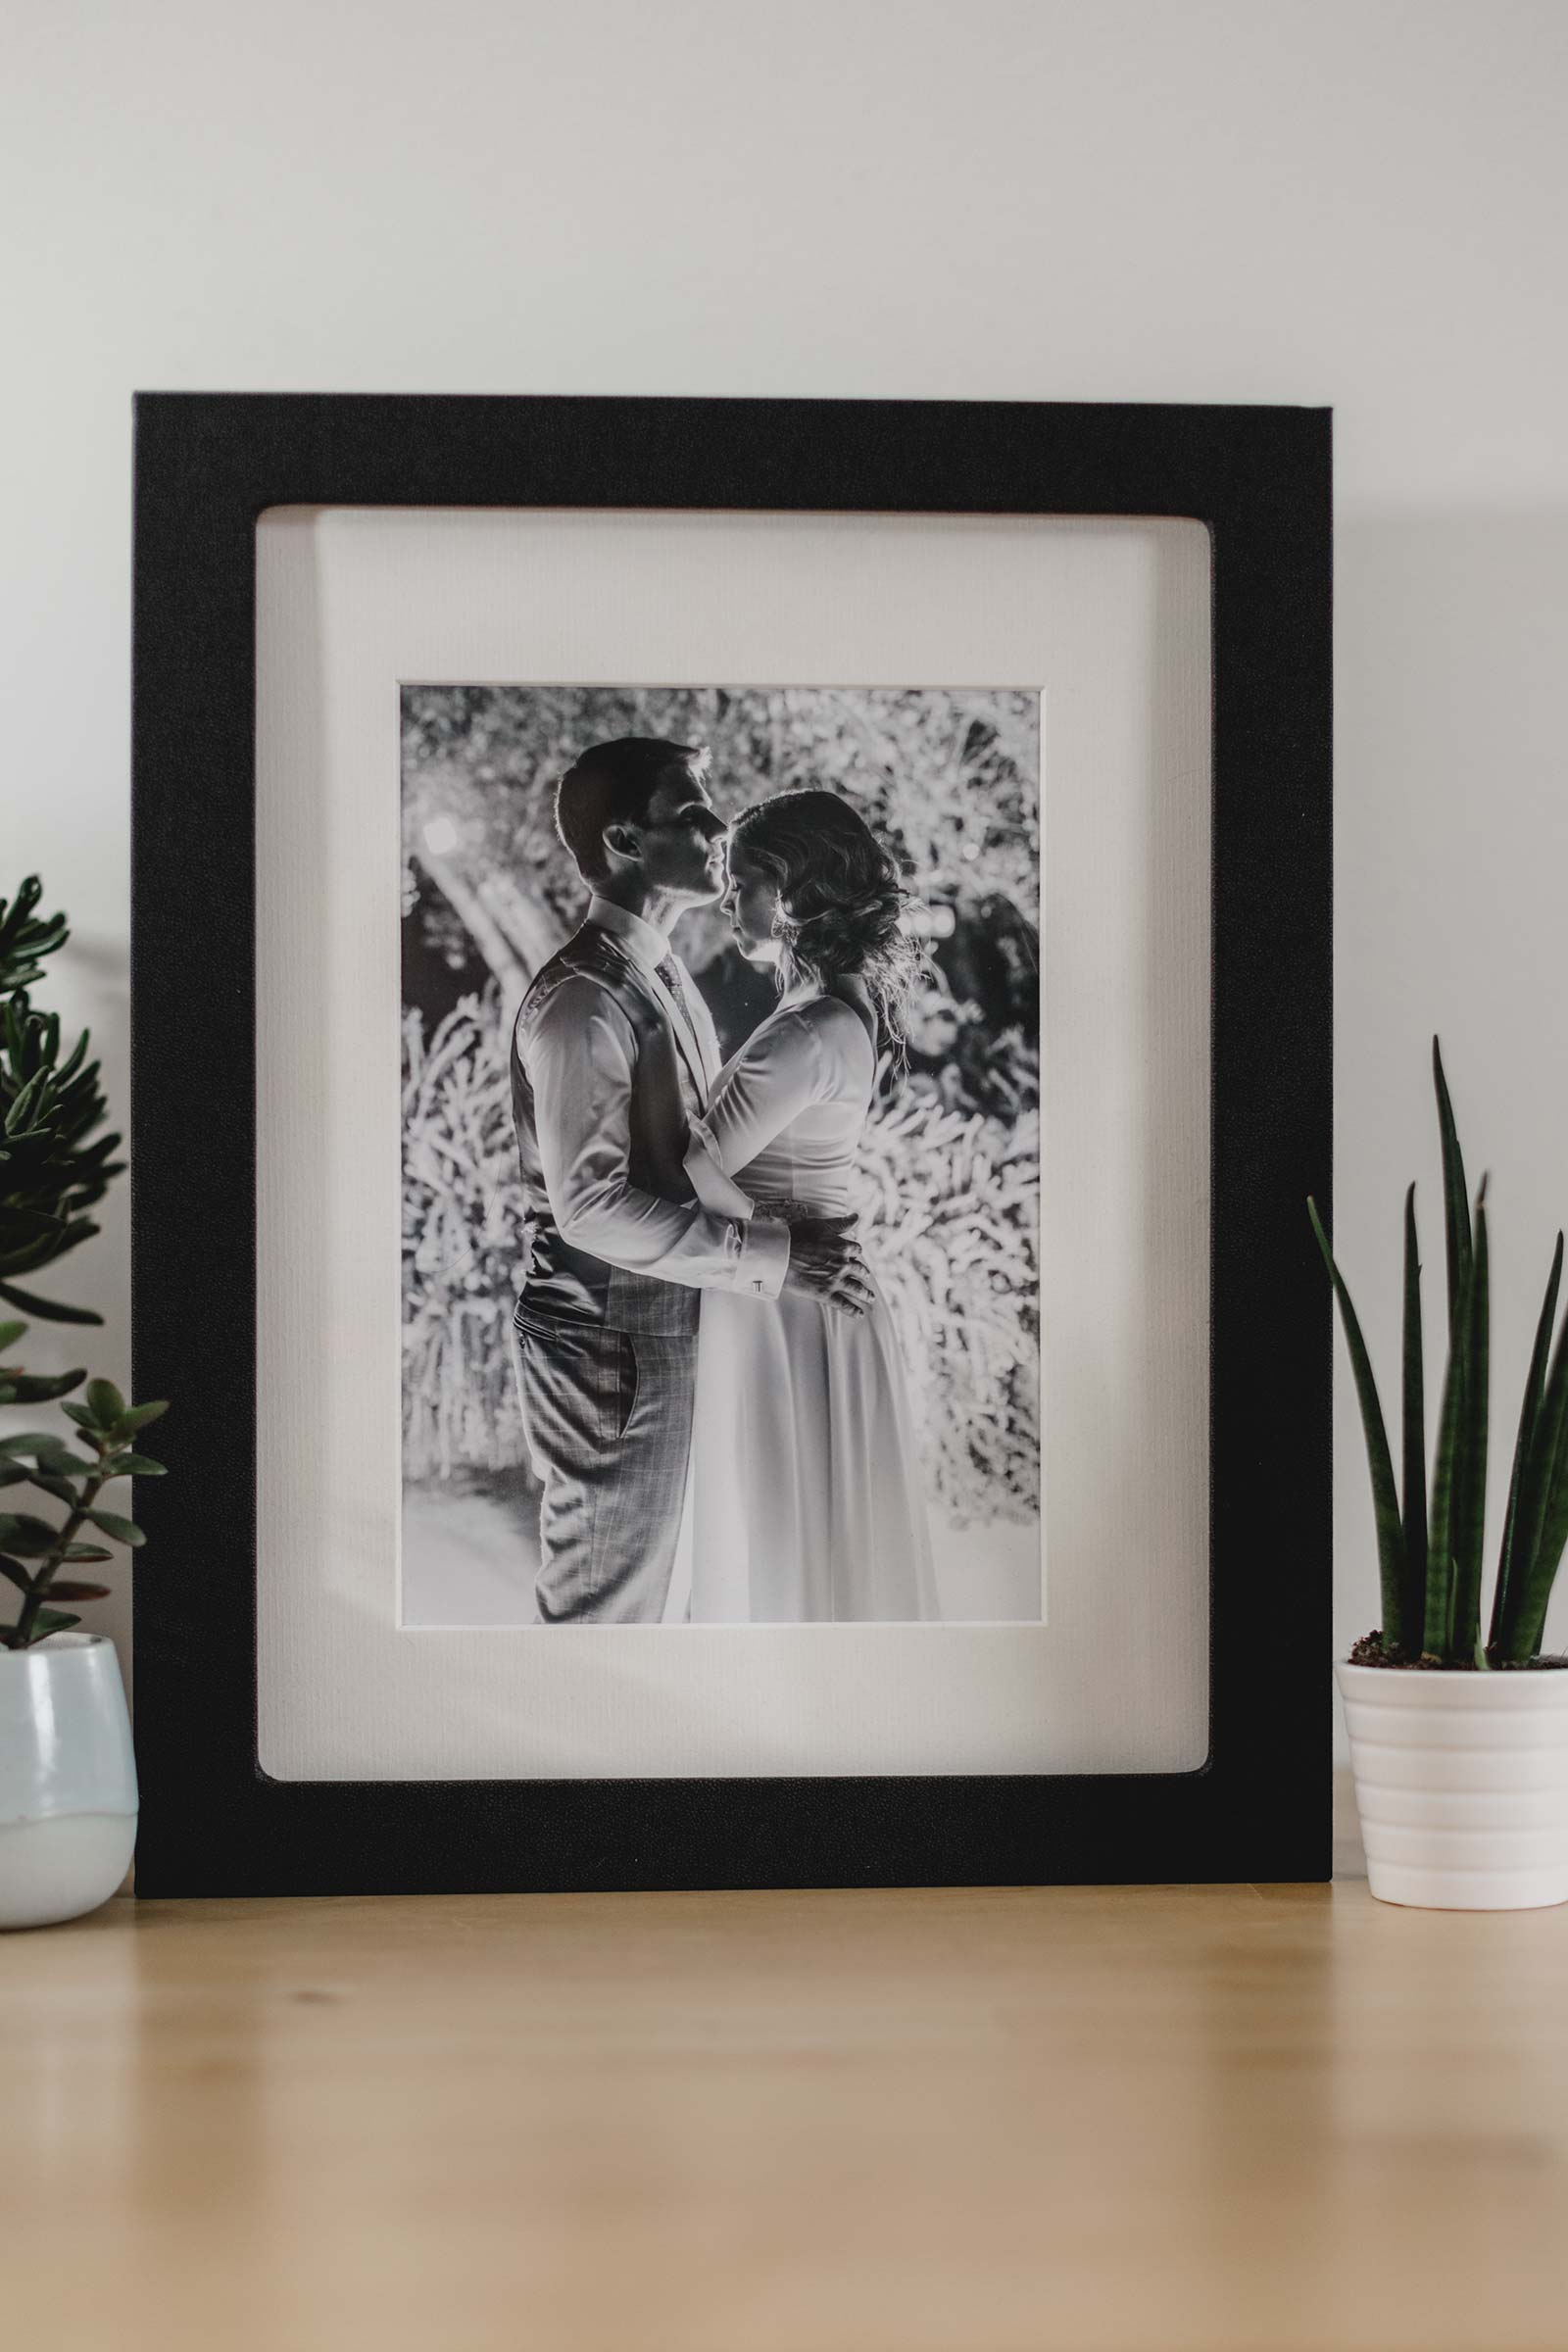 Black elegant luxury box for keeping your wedding images